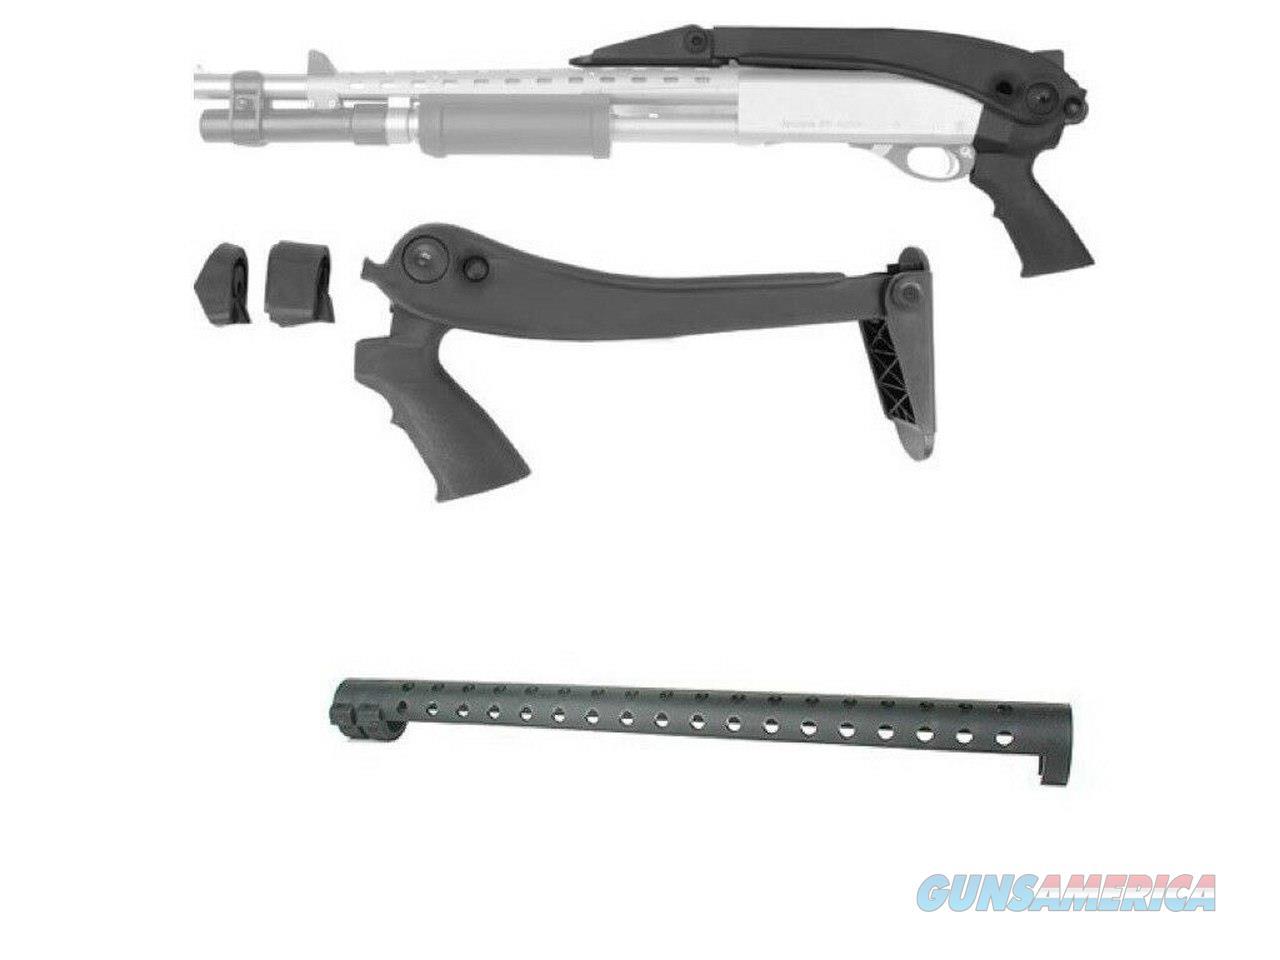 ATI Pistol Grip TOP FOLDING Stock Pistol Grip Heat Shield Pardner Pump Shotgun !!  Non-Guns > Ammunition